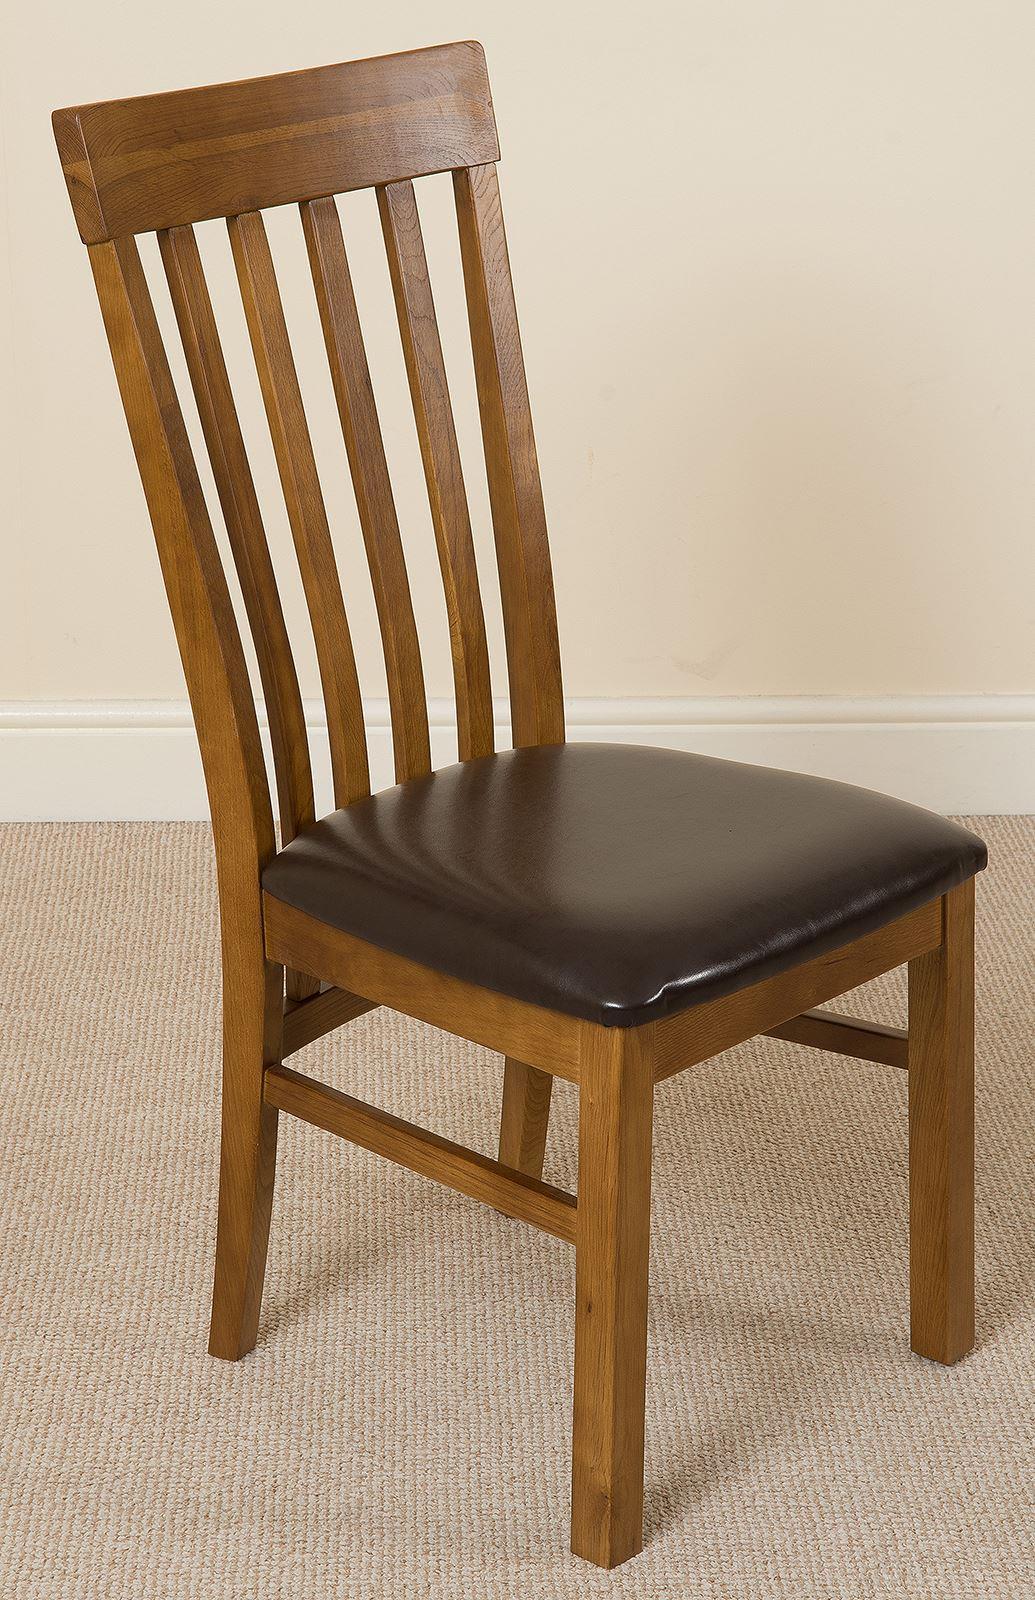 Harvard Solid Oak Rustic Wood amp Brown Leather Dining Chair  : F21550420F464C81B2879CD781818386 from oakfurnitureking.co.uk size 1035 x 1600 jpeg 317kB